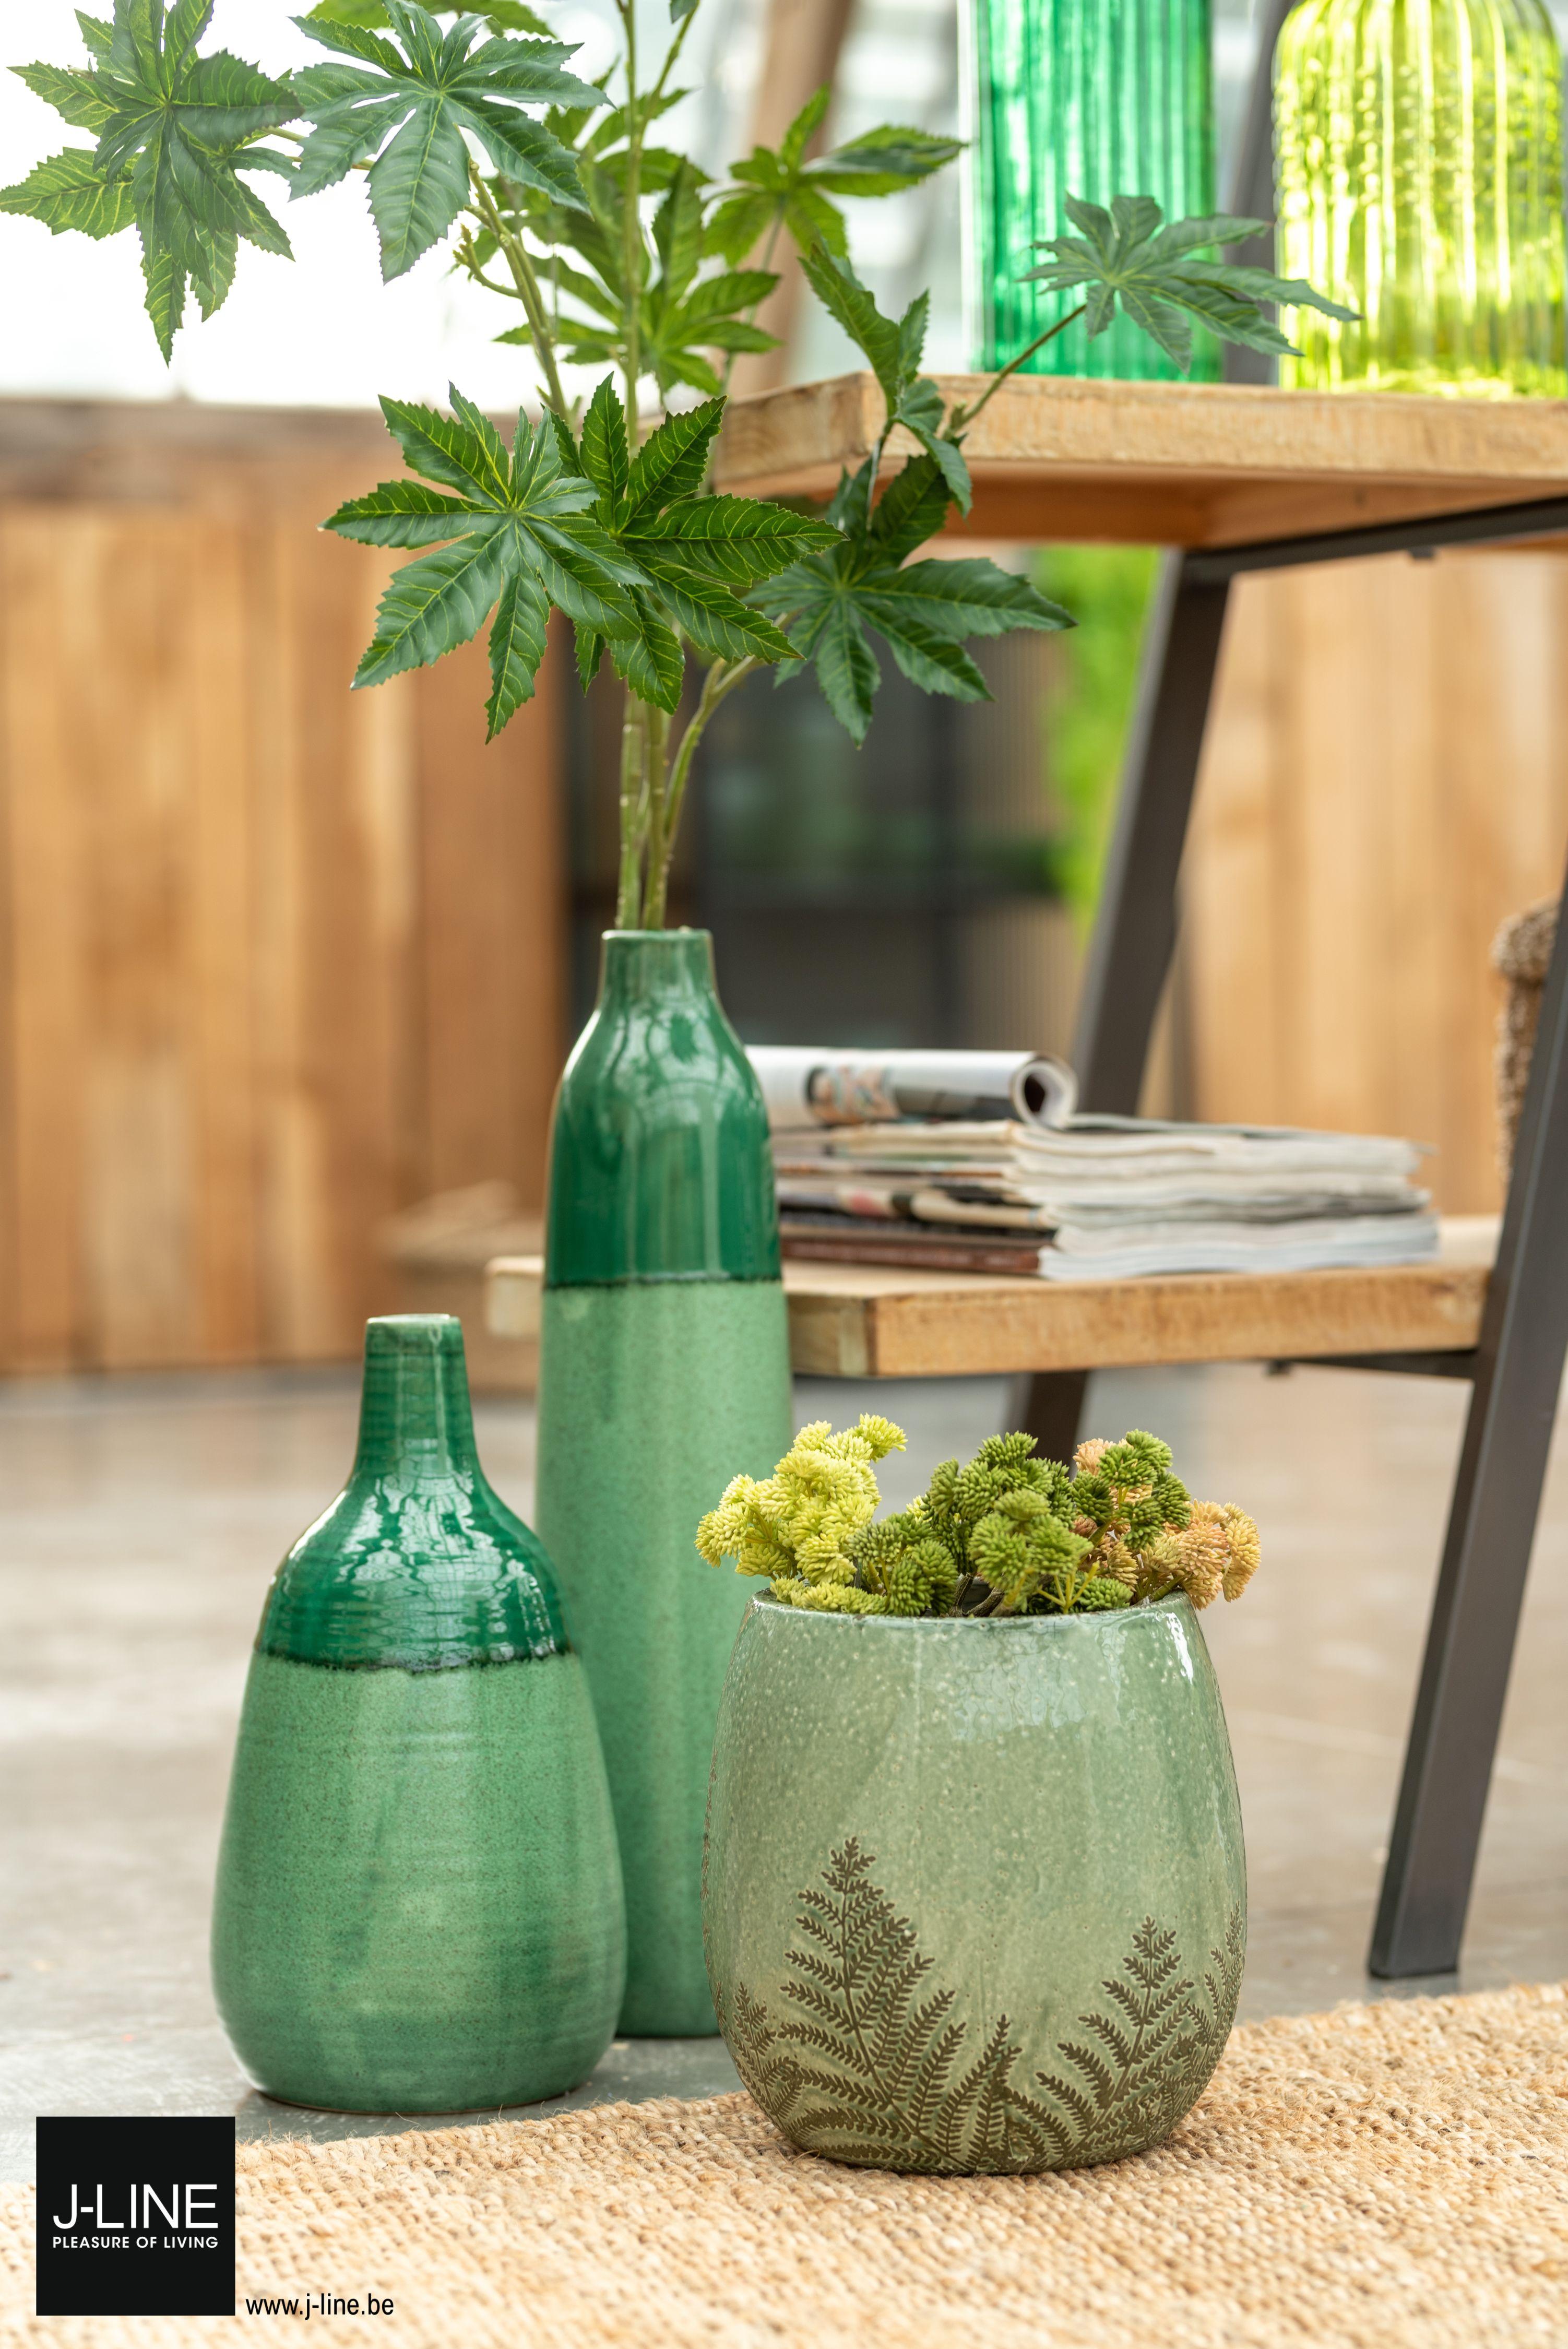 Jline Decoration Tropical Lagoon Spring Summer New Collection Ss2019 Rack Vases Flowerpot Tropical Rug Pleasureofliving Jlinedecoration